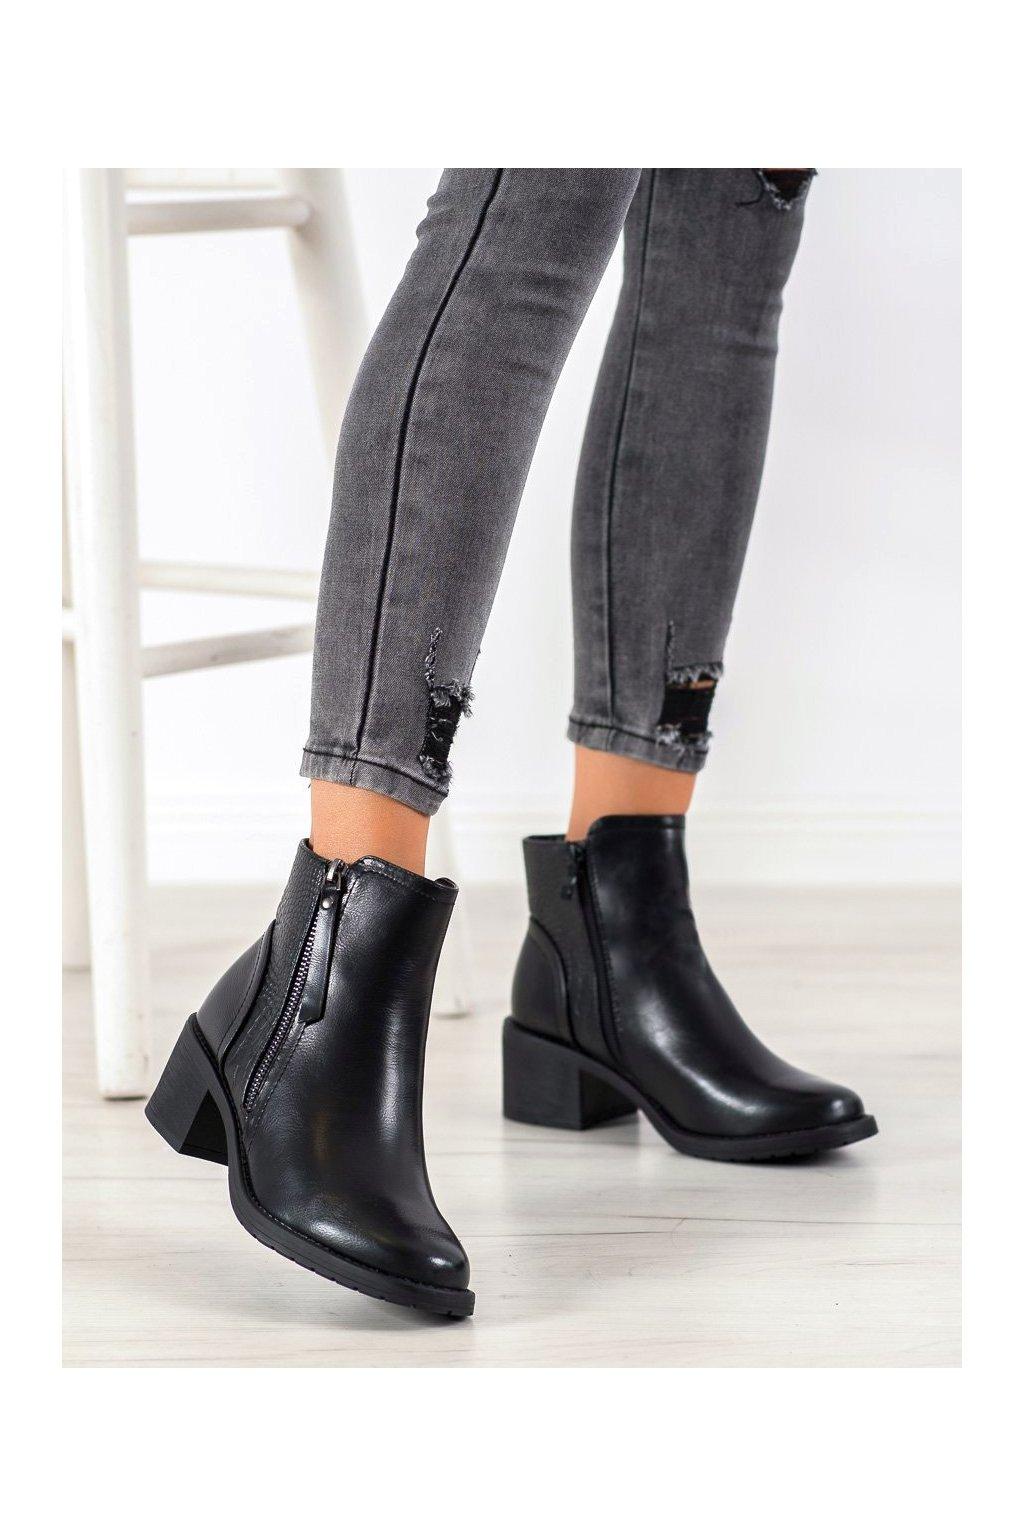 Čierne dámske topánky Small swan kod F807B